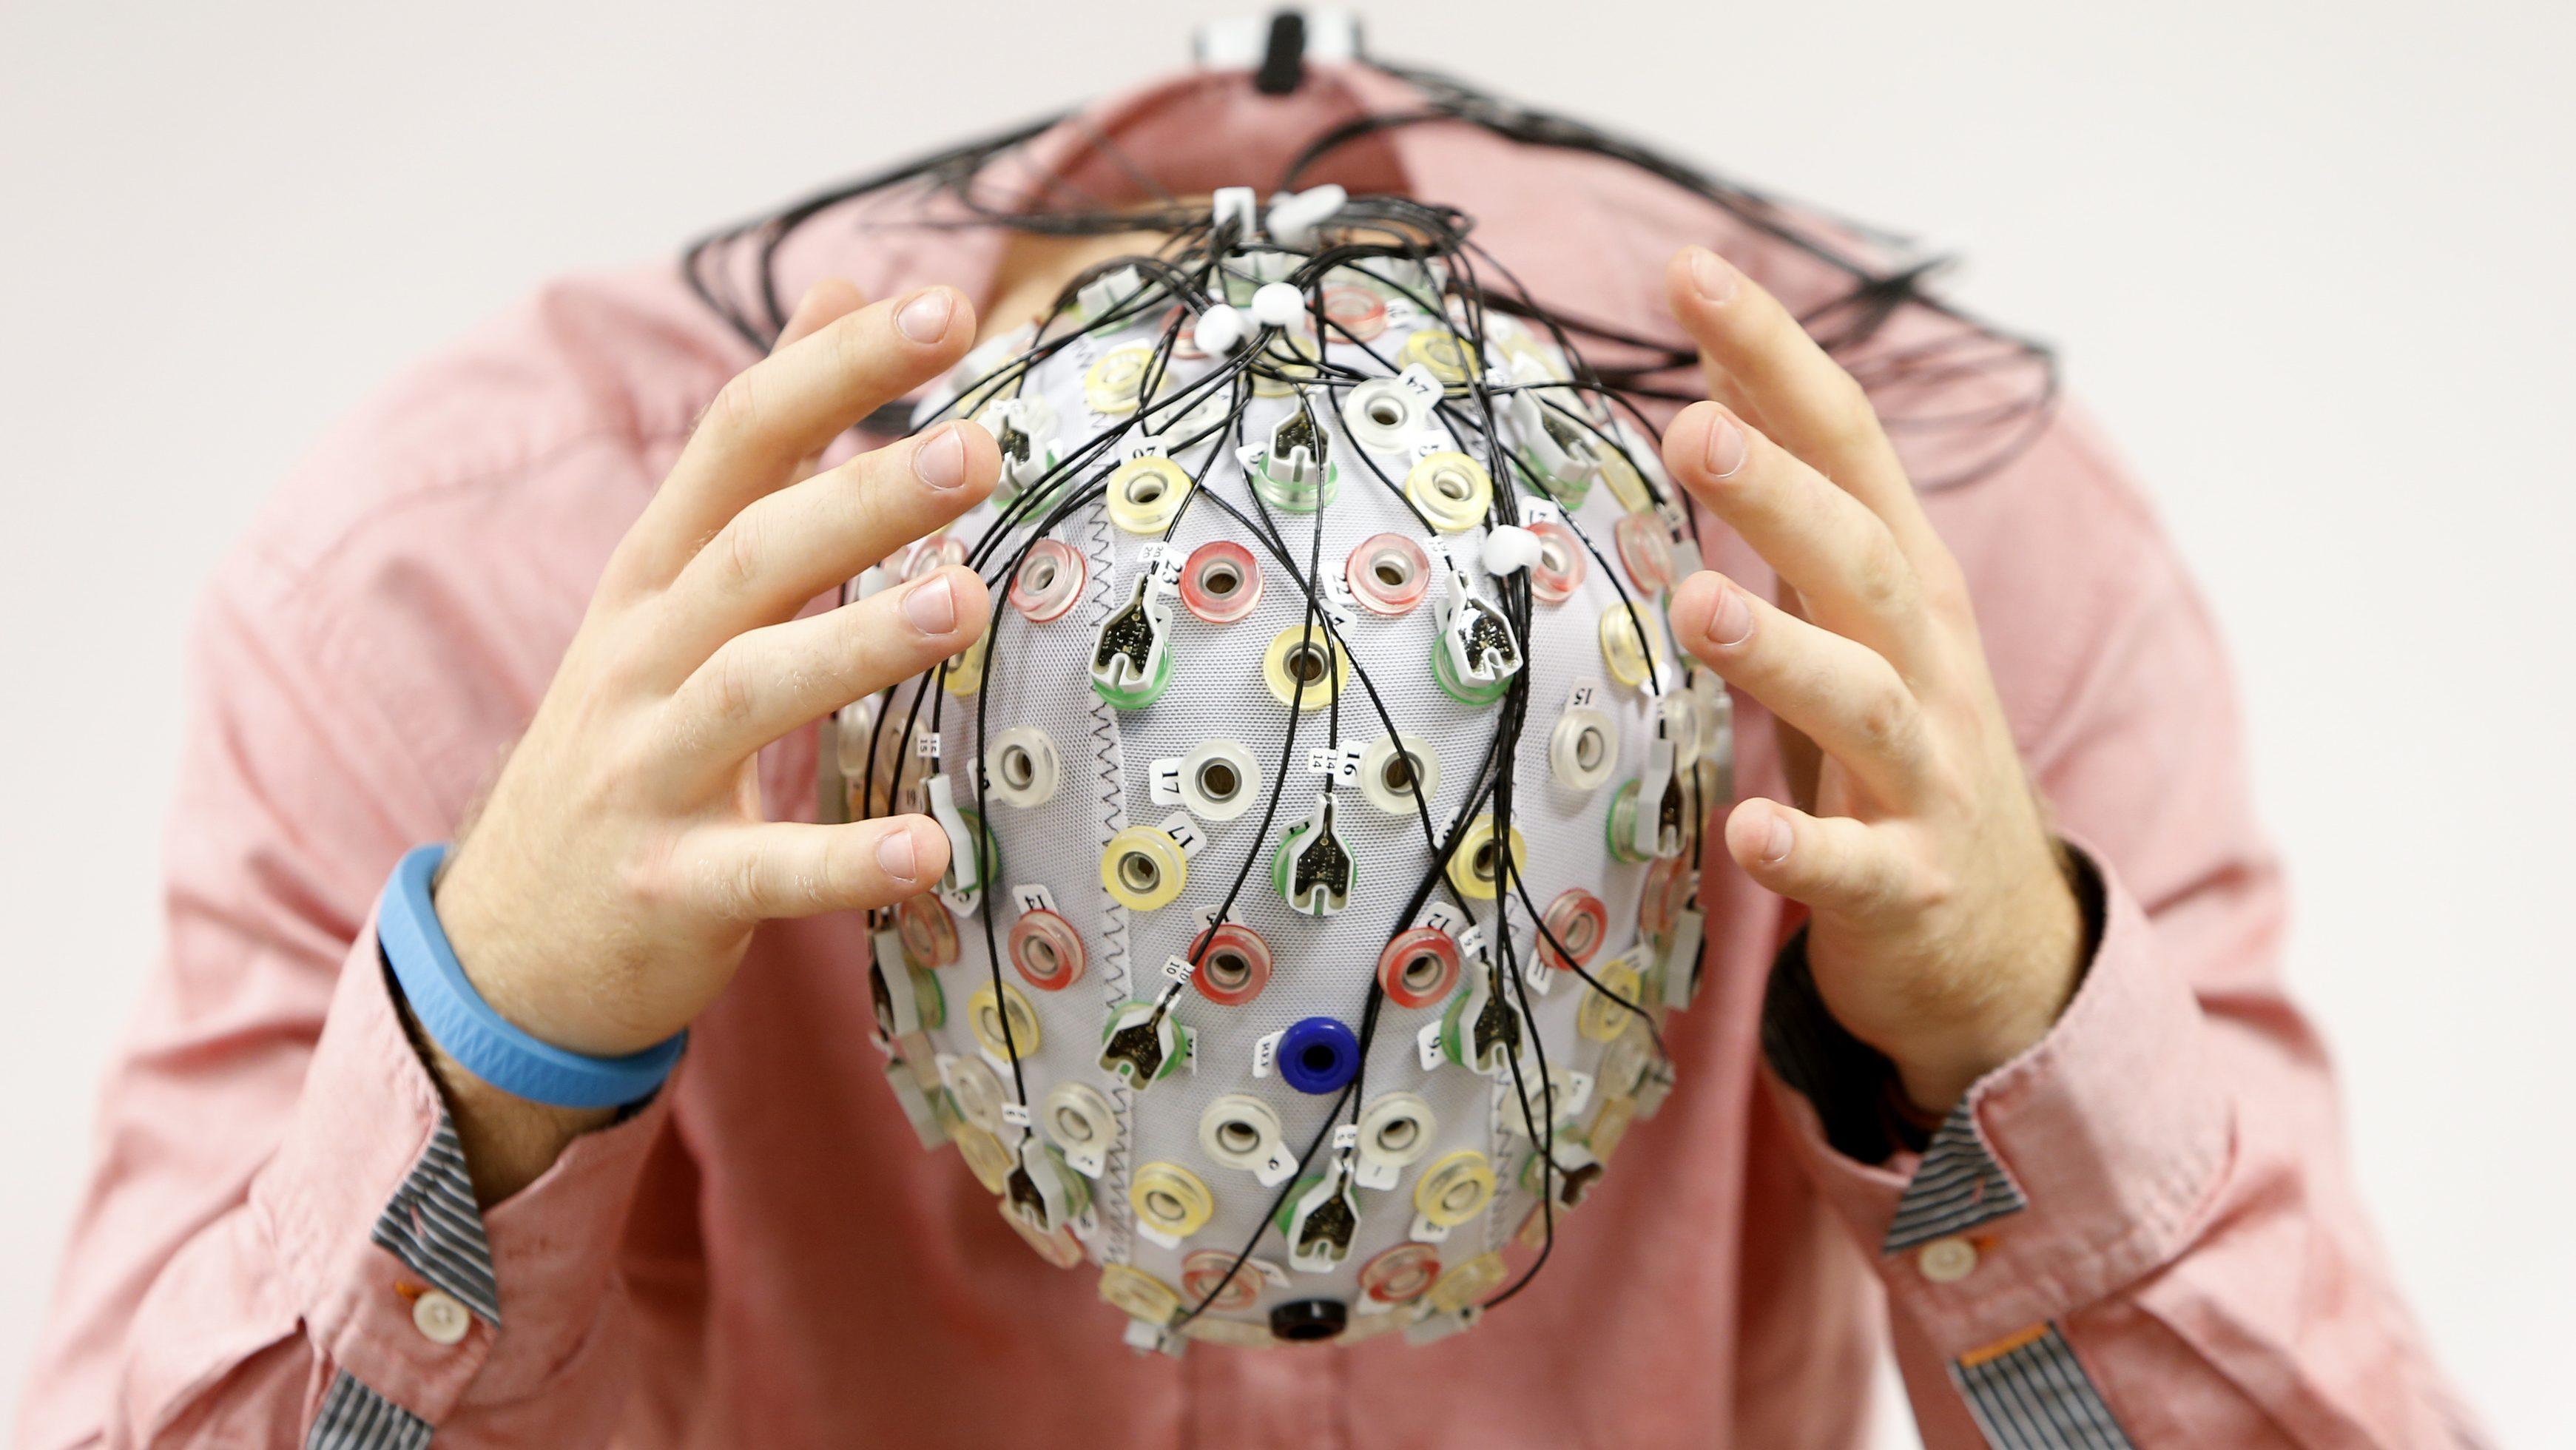 Test subject in an electroencephalography (EEG) cap